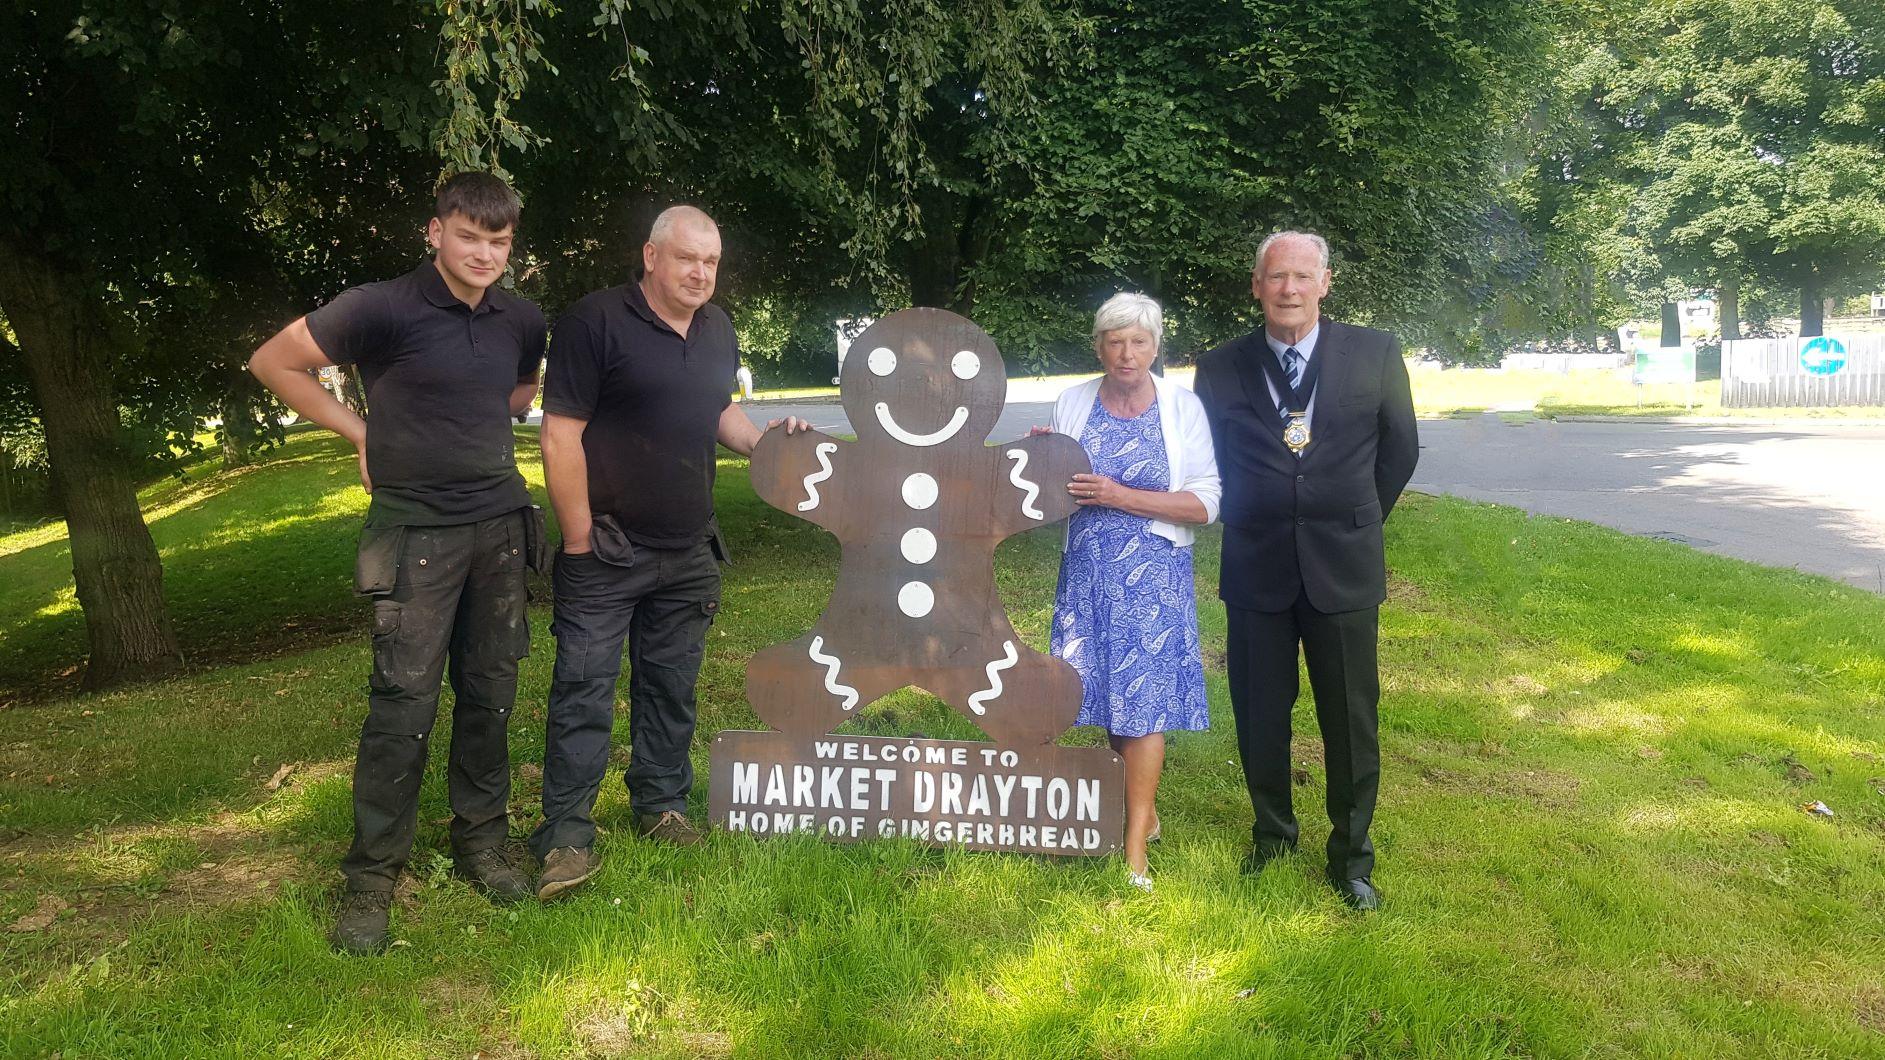 Gingerbread Man in Market Drayton